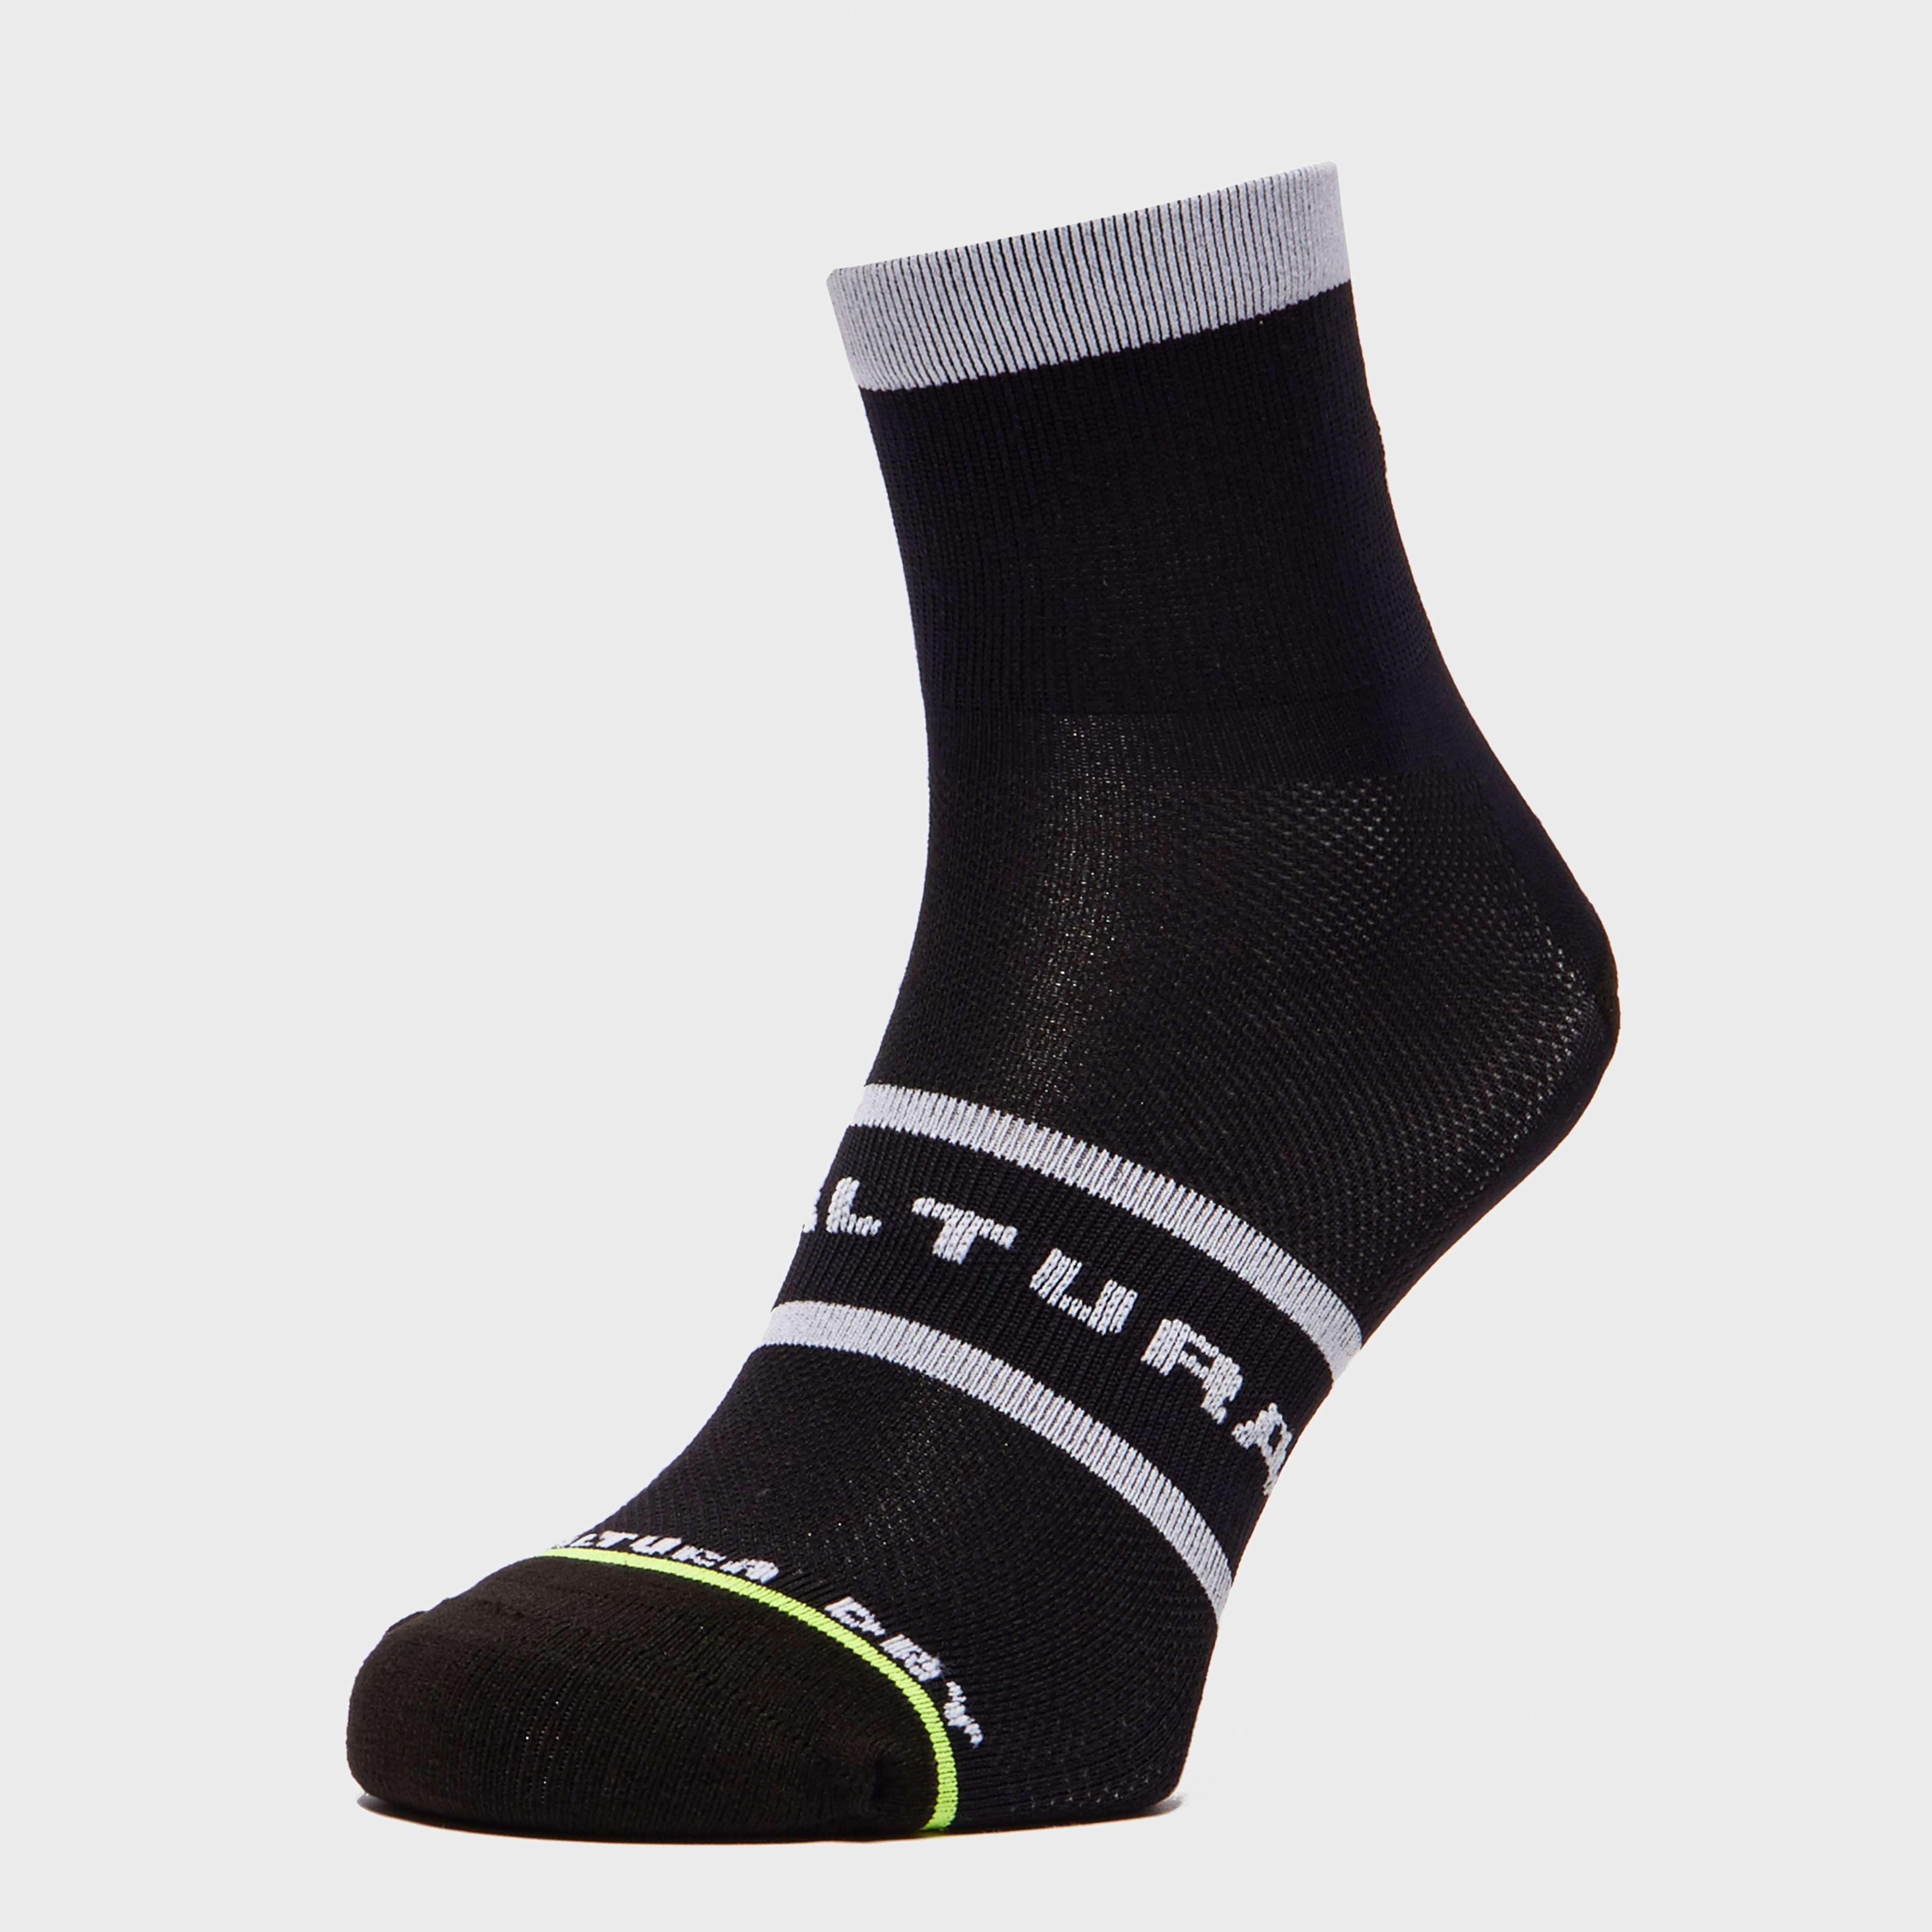 ALTURA Men's Dry Socks